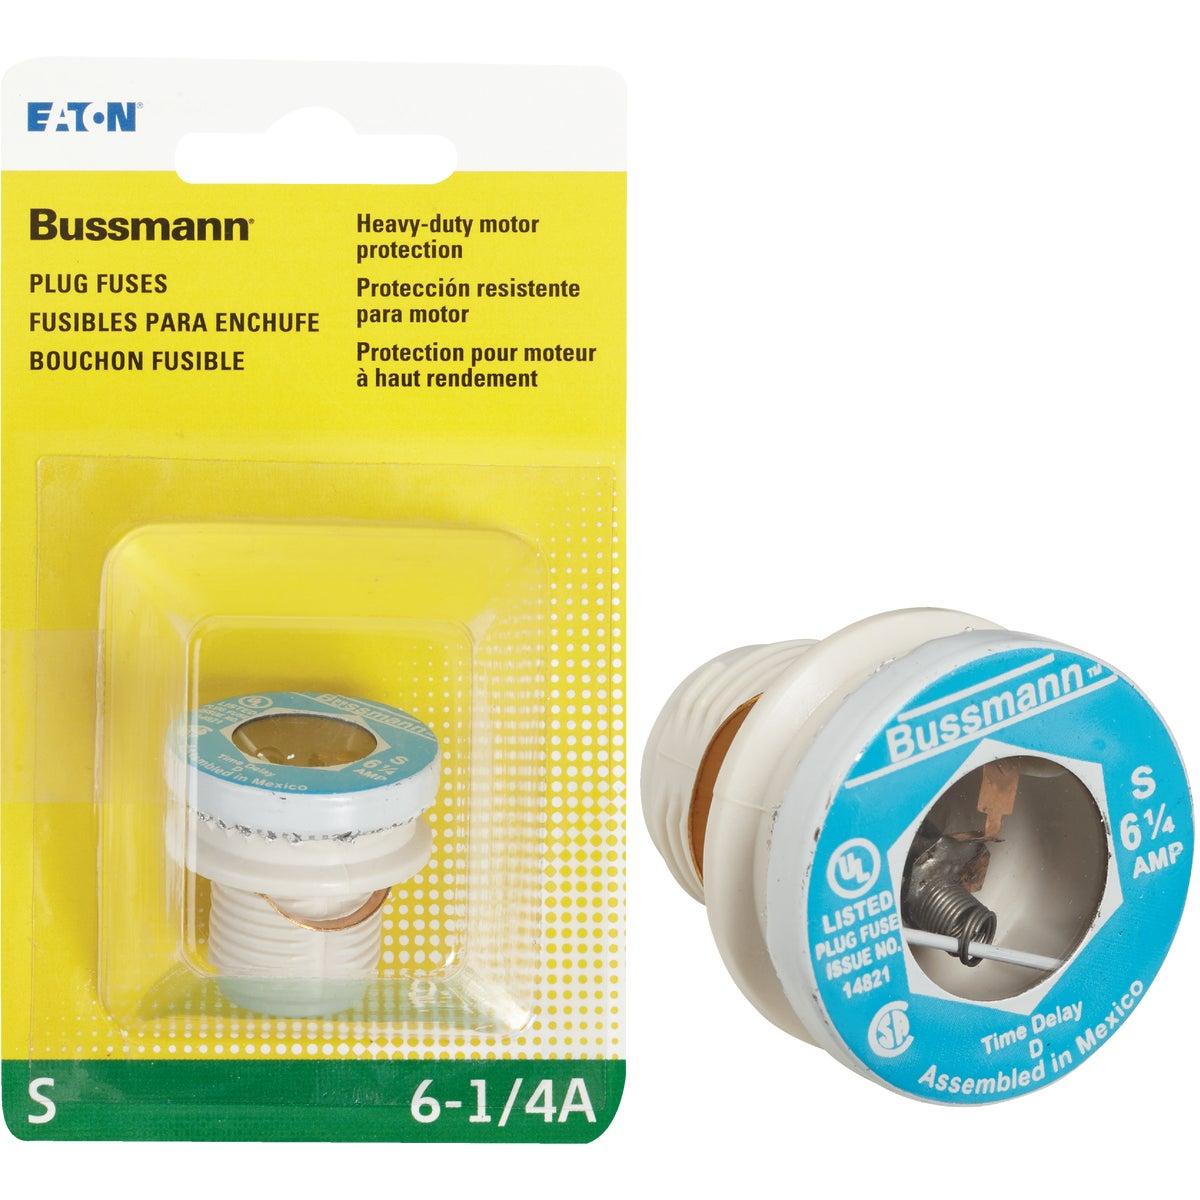 6-1/4A S PLUG FUSE - BP/S-6-1/4 by Bussmann Cooper